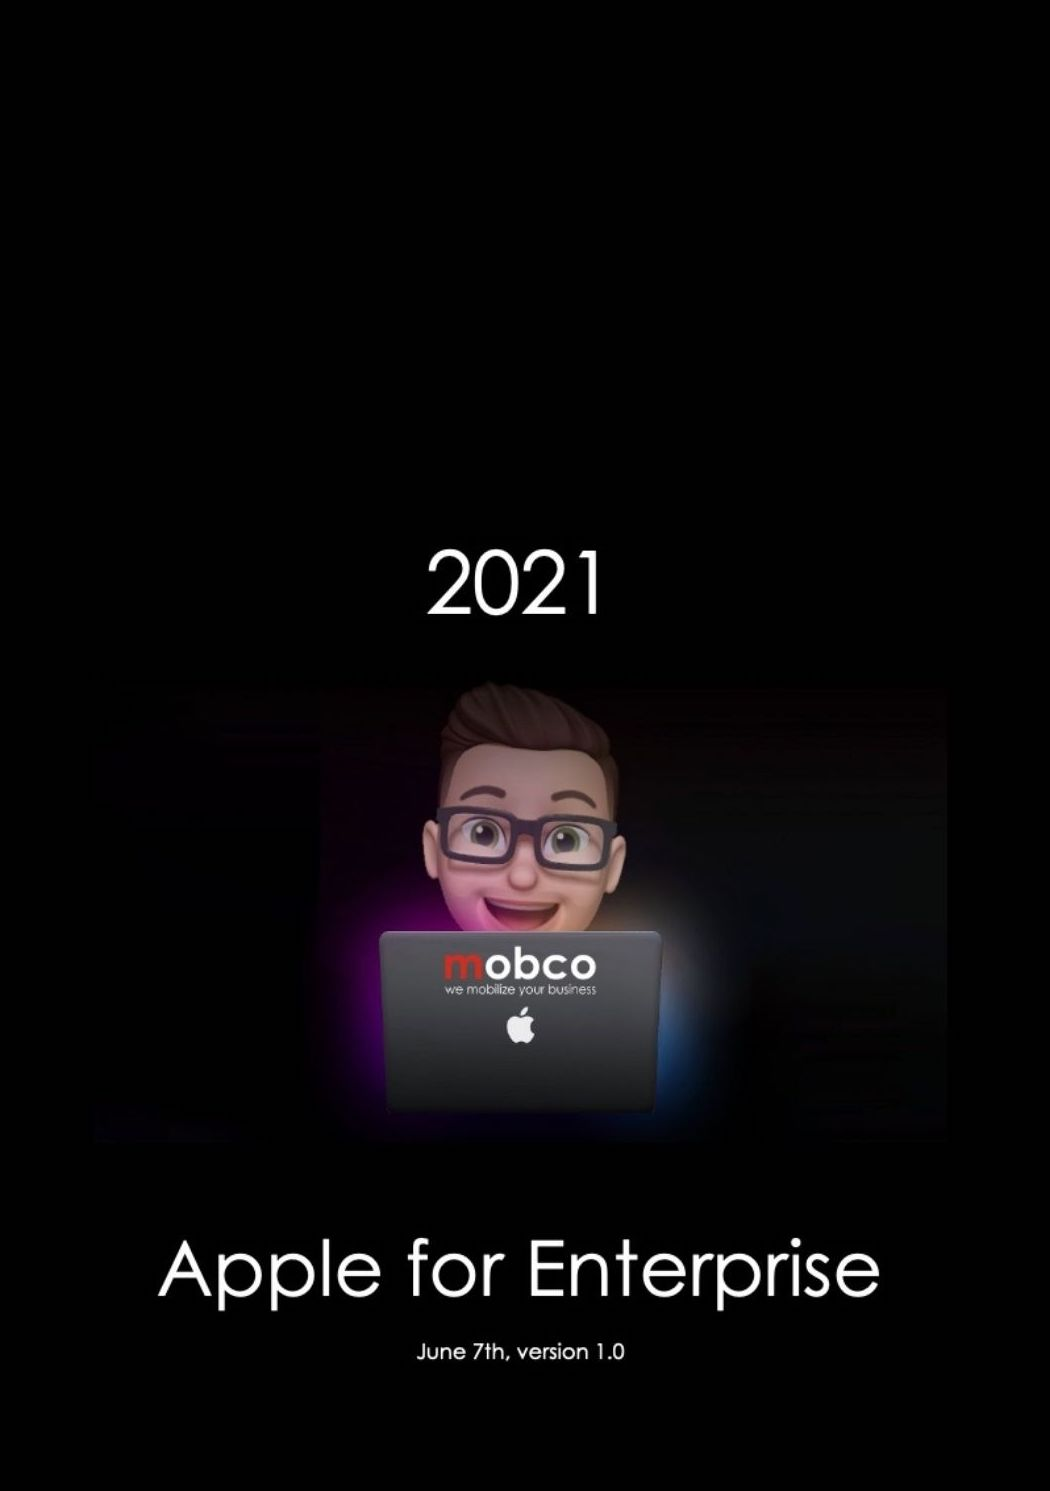 Apple for enterprise 2021 edition, based on Apple's WWDC 2021